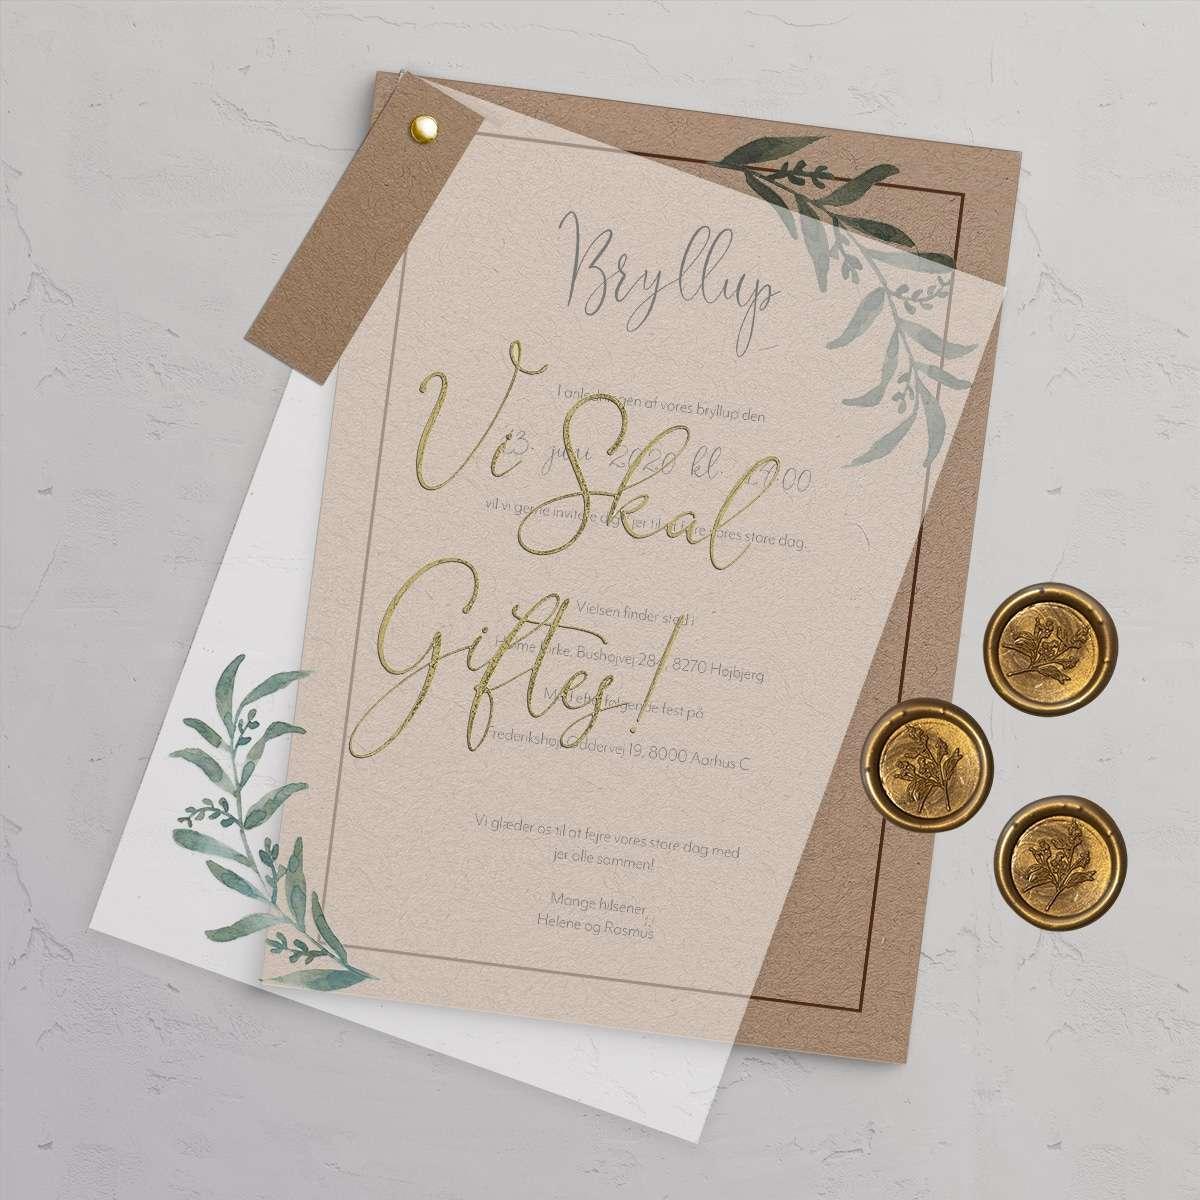 Bryllupsinvitationen Golden Branches rustik og naturlig bryllupsinvitation trykt på genbrugspapir med vellum (kalkerpapir) forside med antique gold folie. Stylet med kæreskilt og laksegl med grene motiv